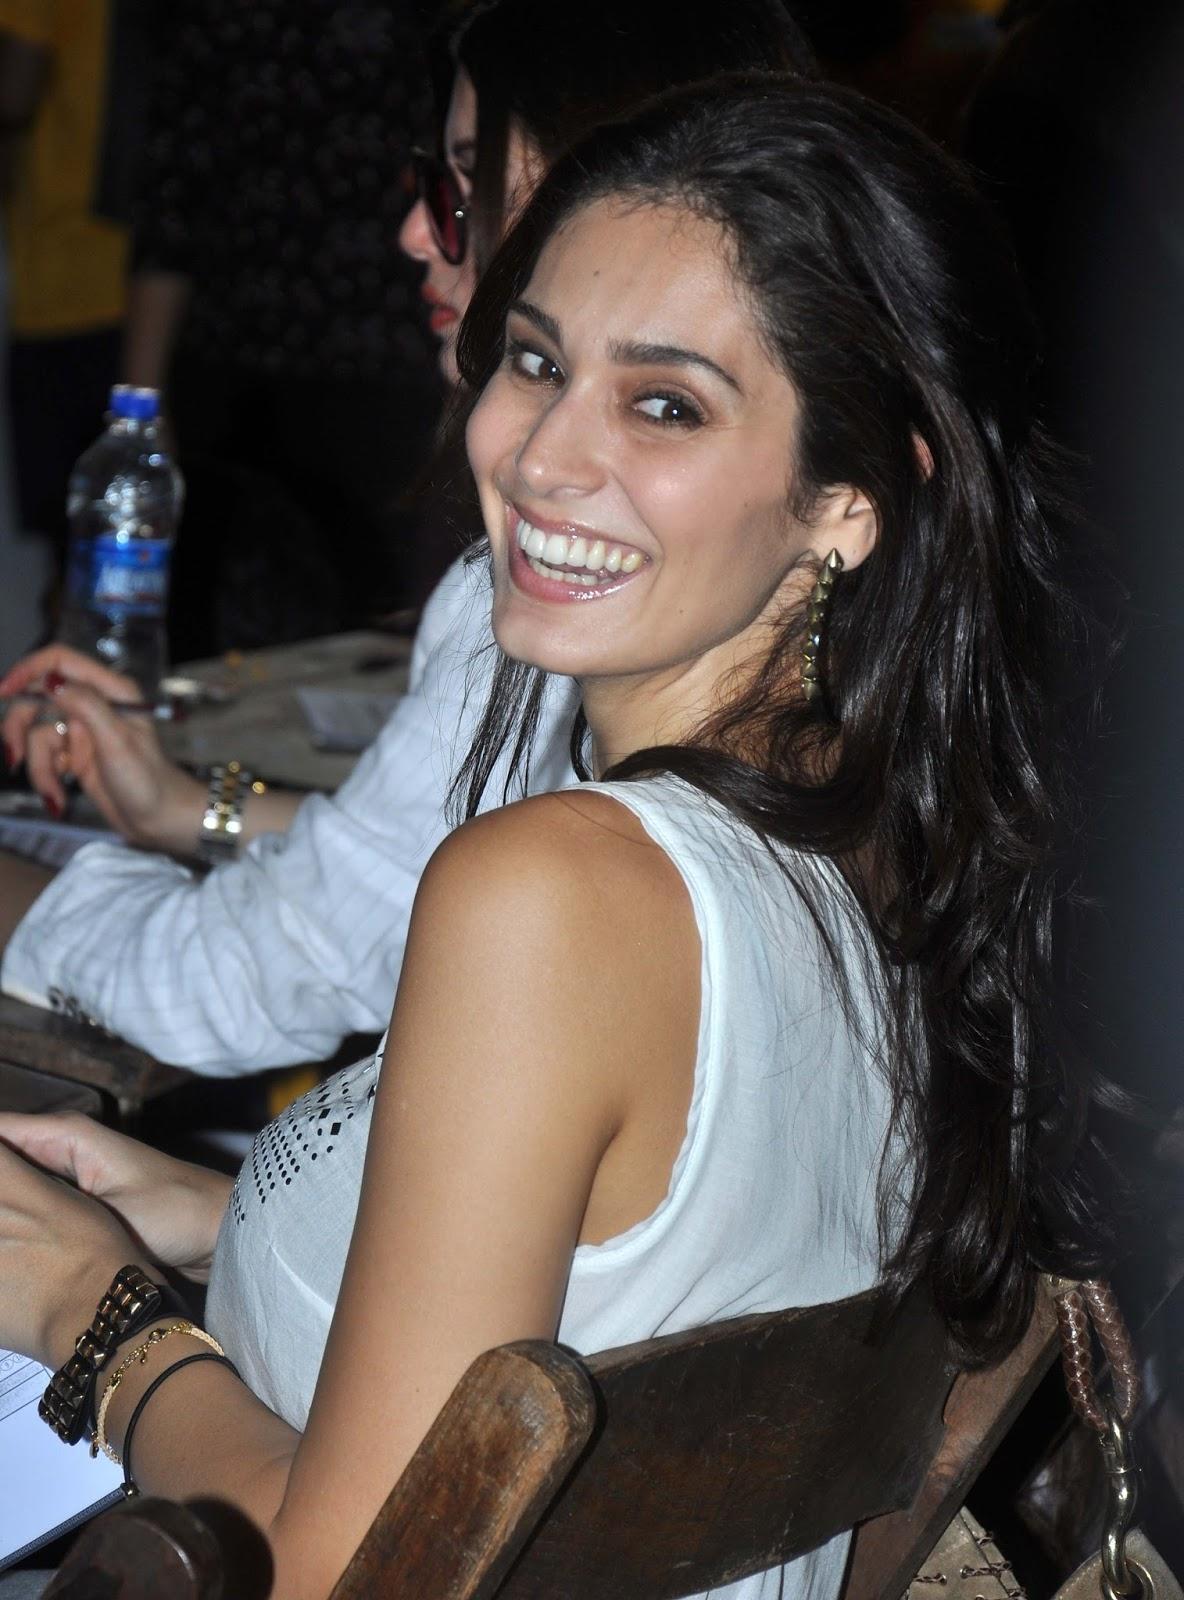 Bruna Laila bruna abdullah showing off her amazingly toned midriff at